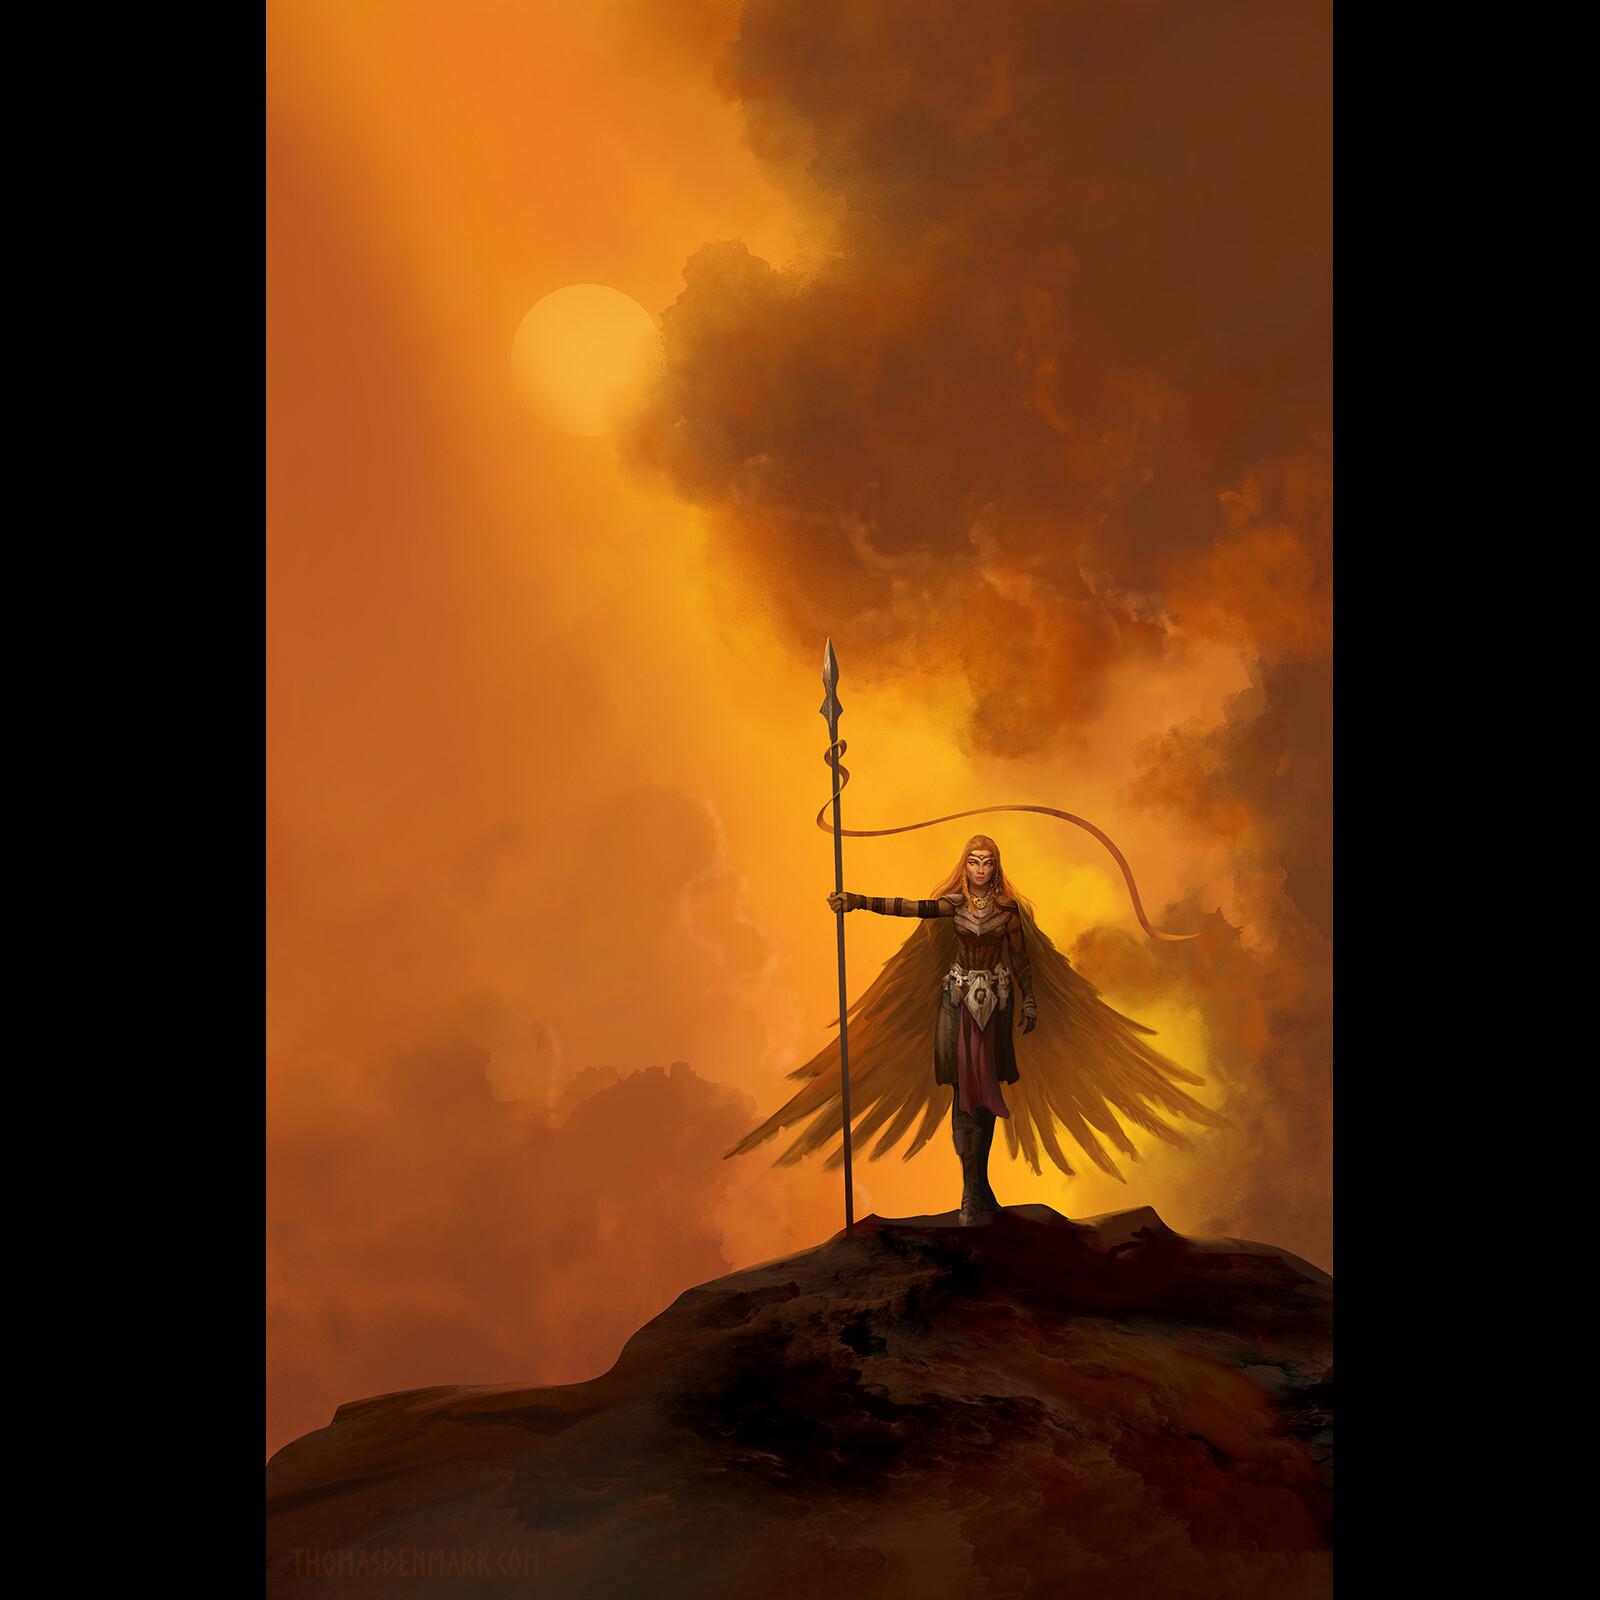 Geiravor - the Spear-Bearer